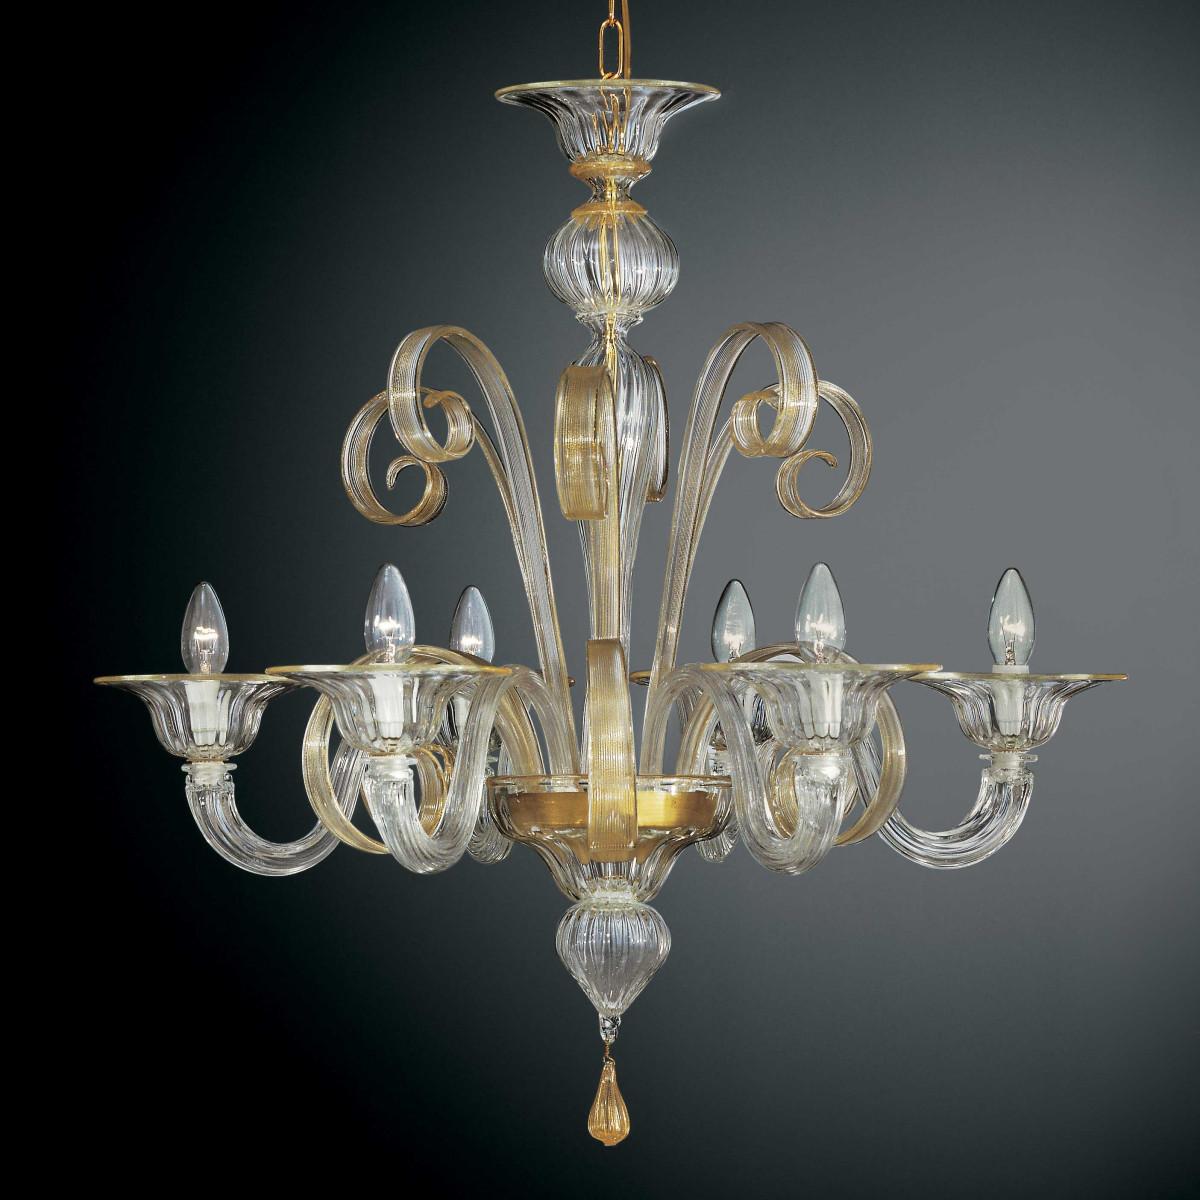 Goldoni 6 flammig Murano Kronleuchter - transparente Gold Farbe